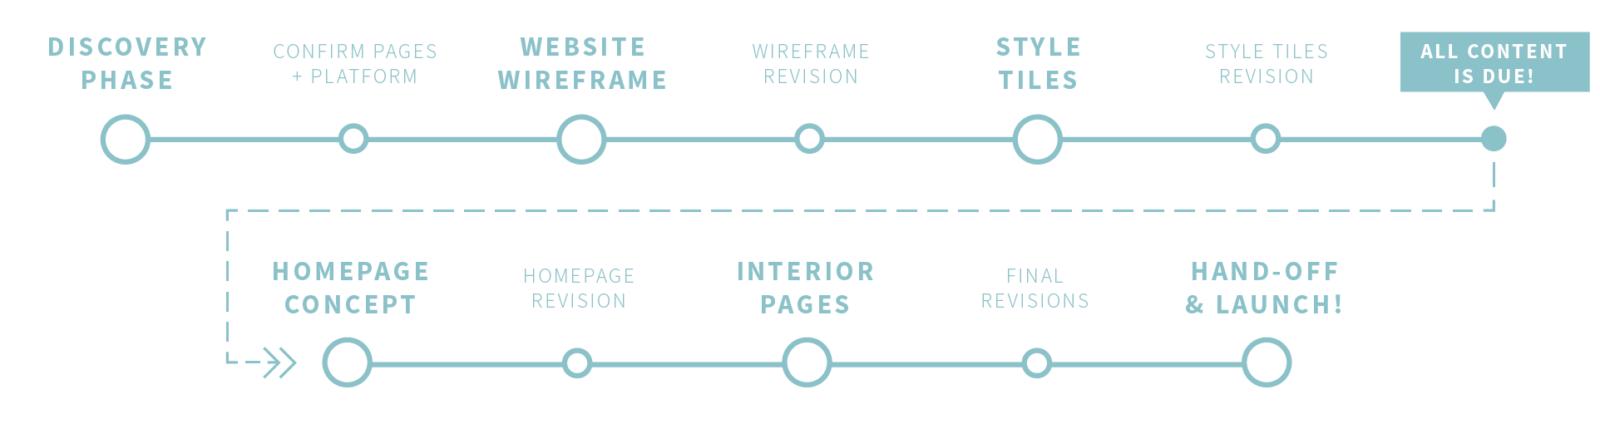 DesignProcess-Standard-Web-12